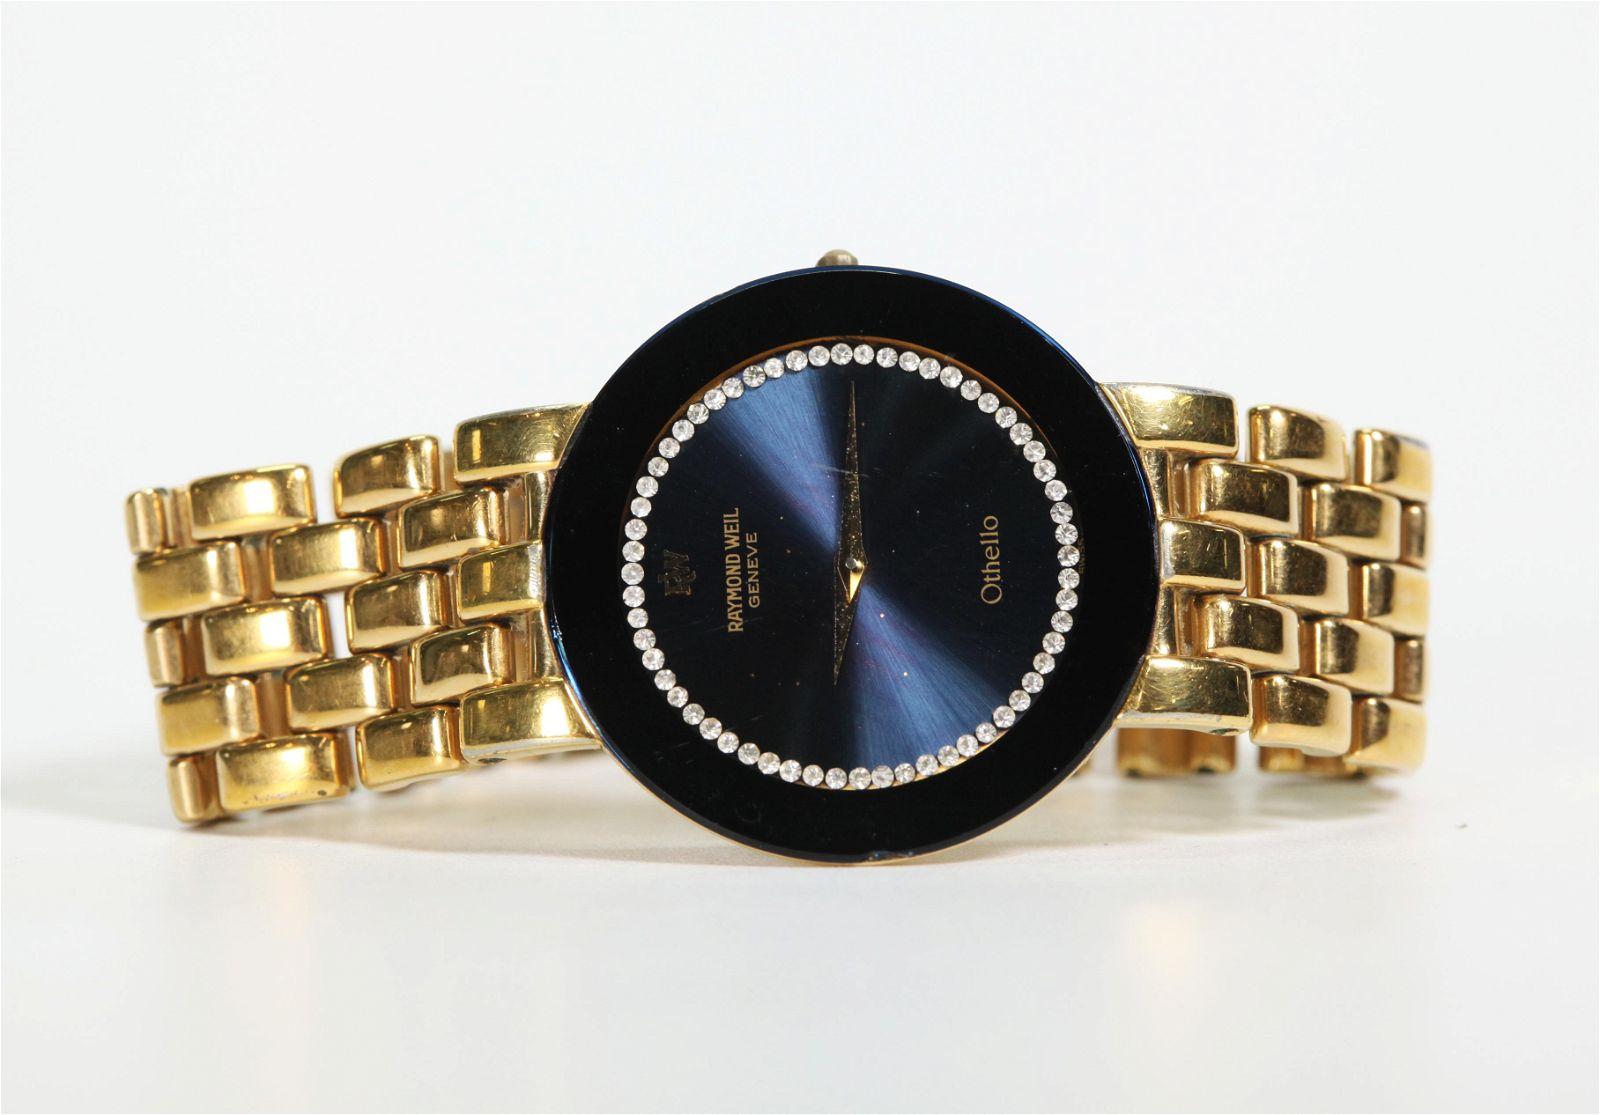 Raymond Weil Othello Quartz Watch Gold Plated Band